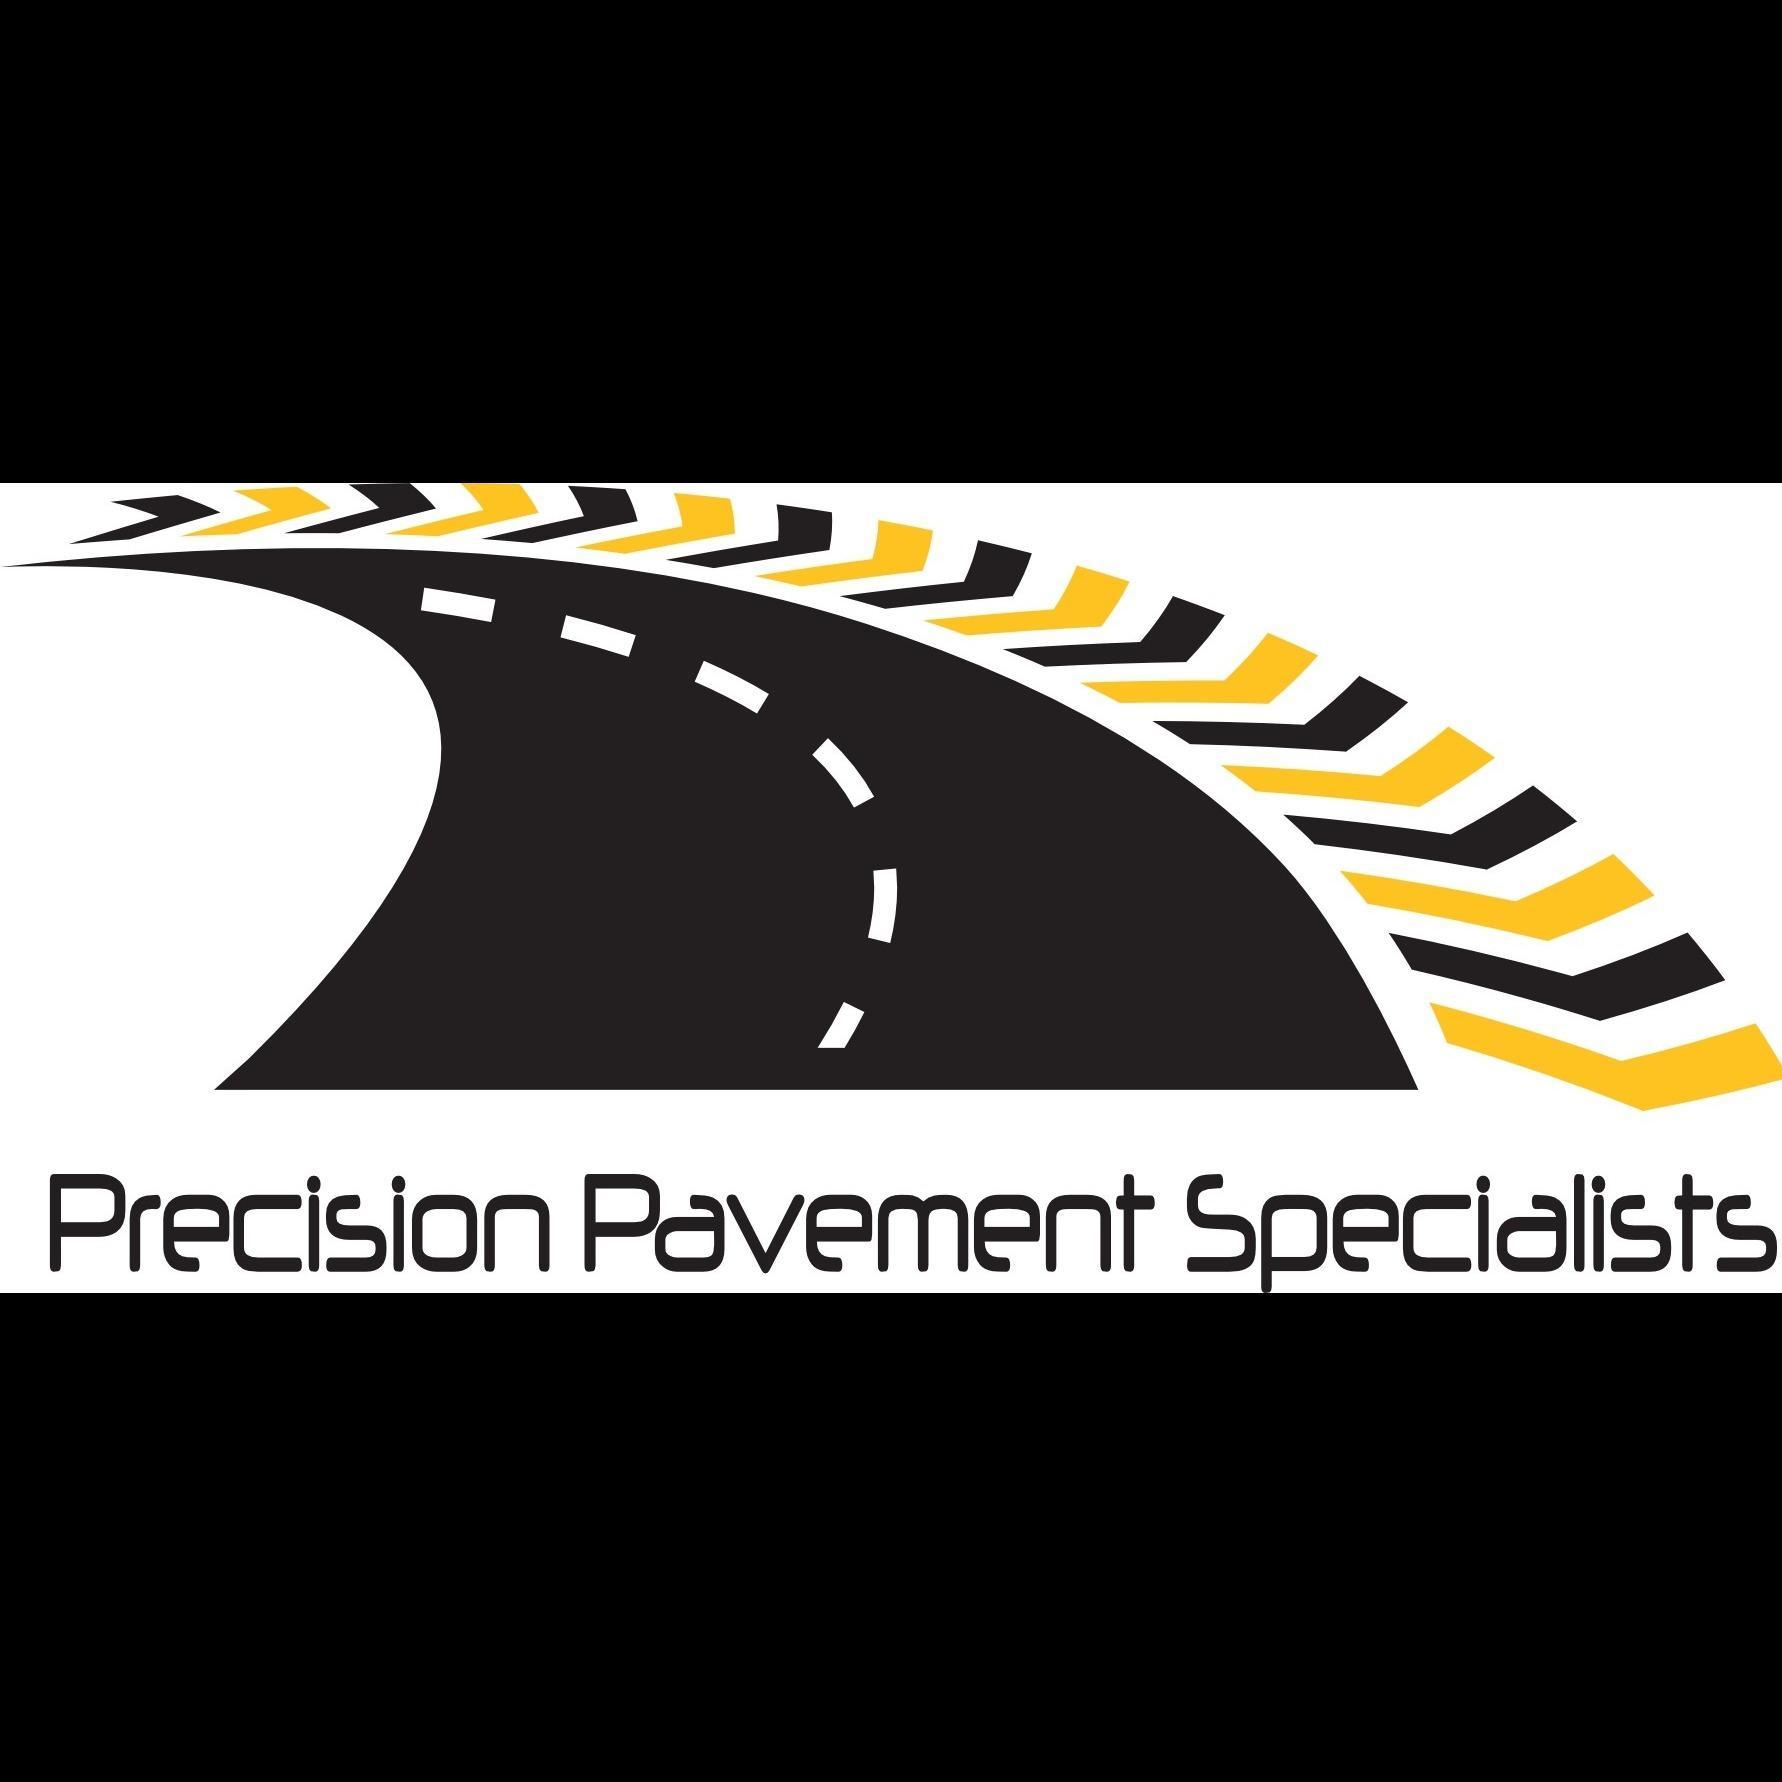 Precision Pavement Specialists image 57